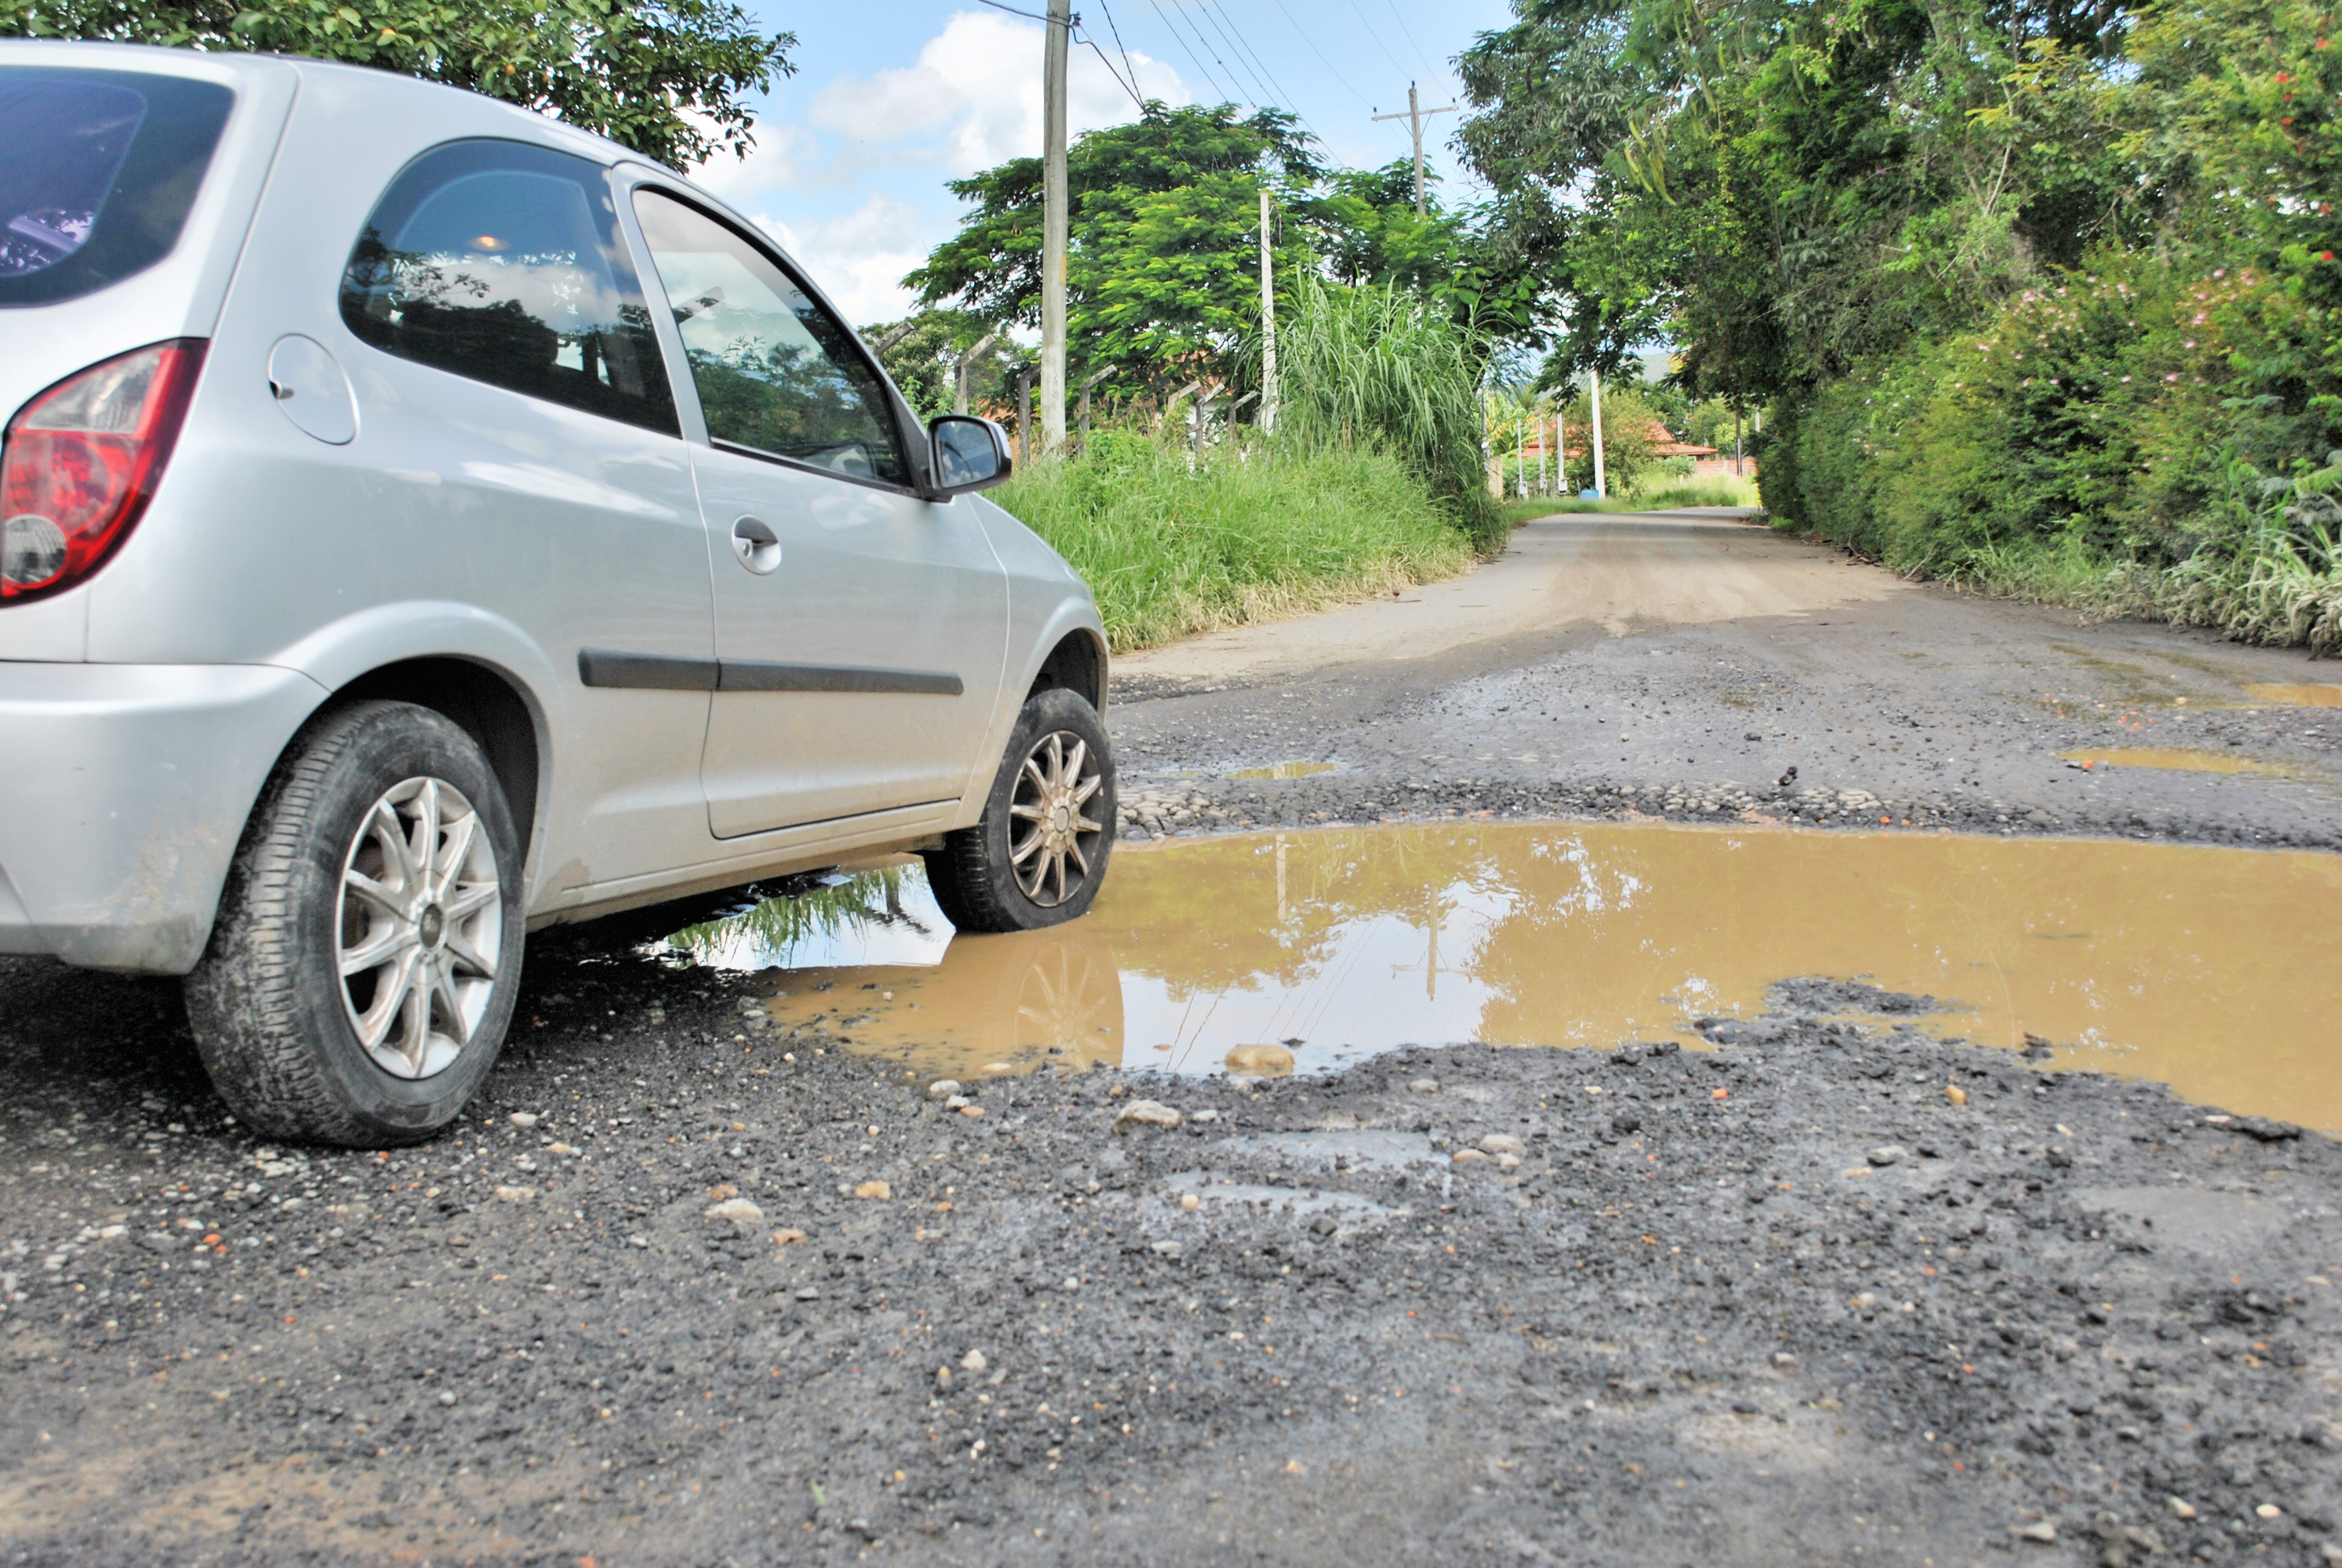 Motorista enfrenta obstáculo causado por descaso com asfaltamento em rua do Washington Beleza (Foto: Andreah Martins)